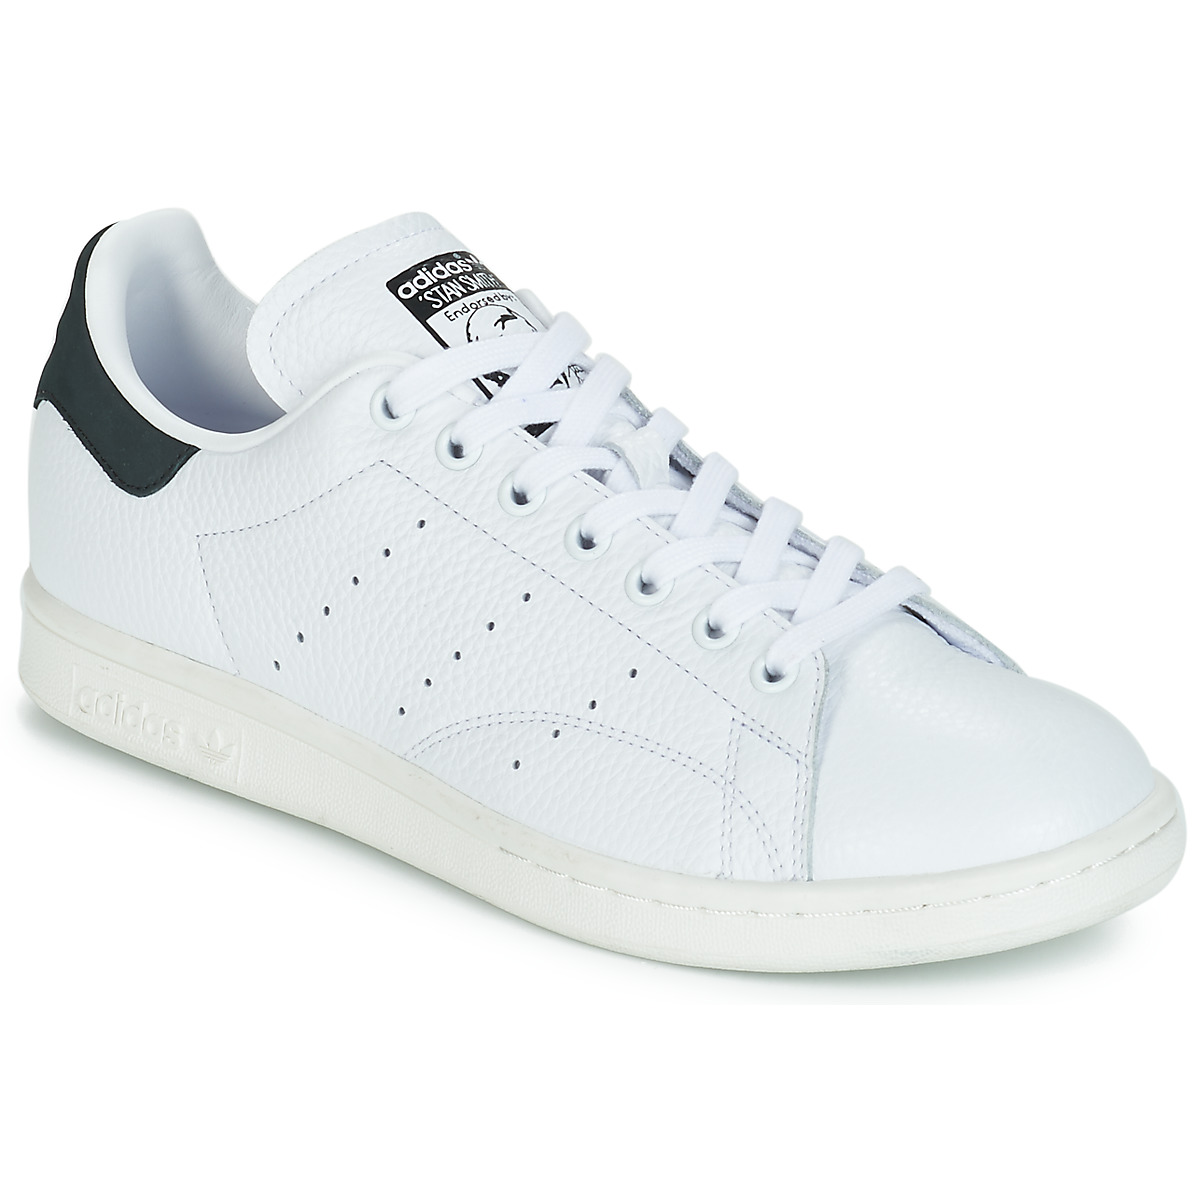 reputable site 44e0b c3eba Adidas Adidas Adidas Originals STAN SMITH Blanco Negro - Nueva promoción -  Zapatos Deportivas bajas 86a6e2